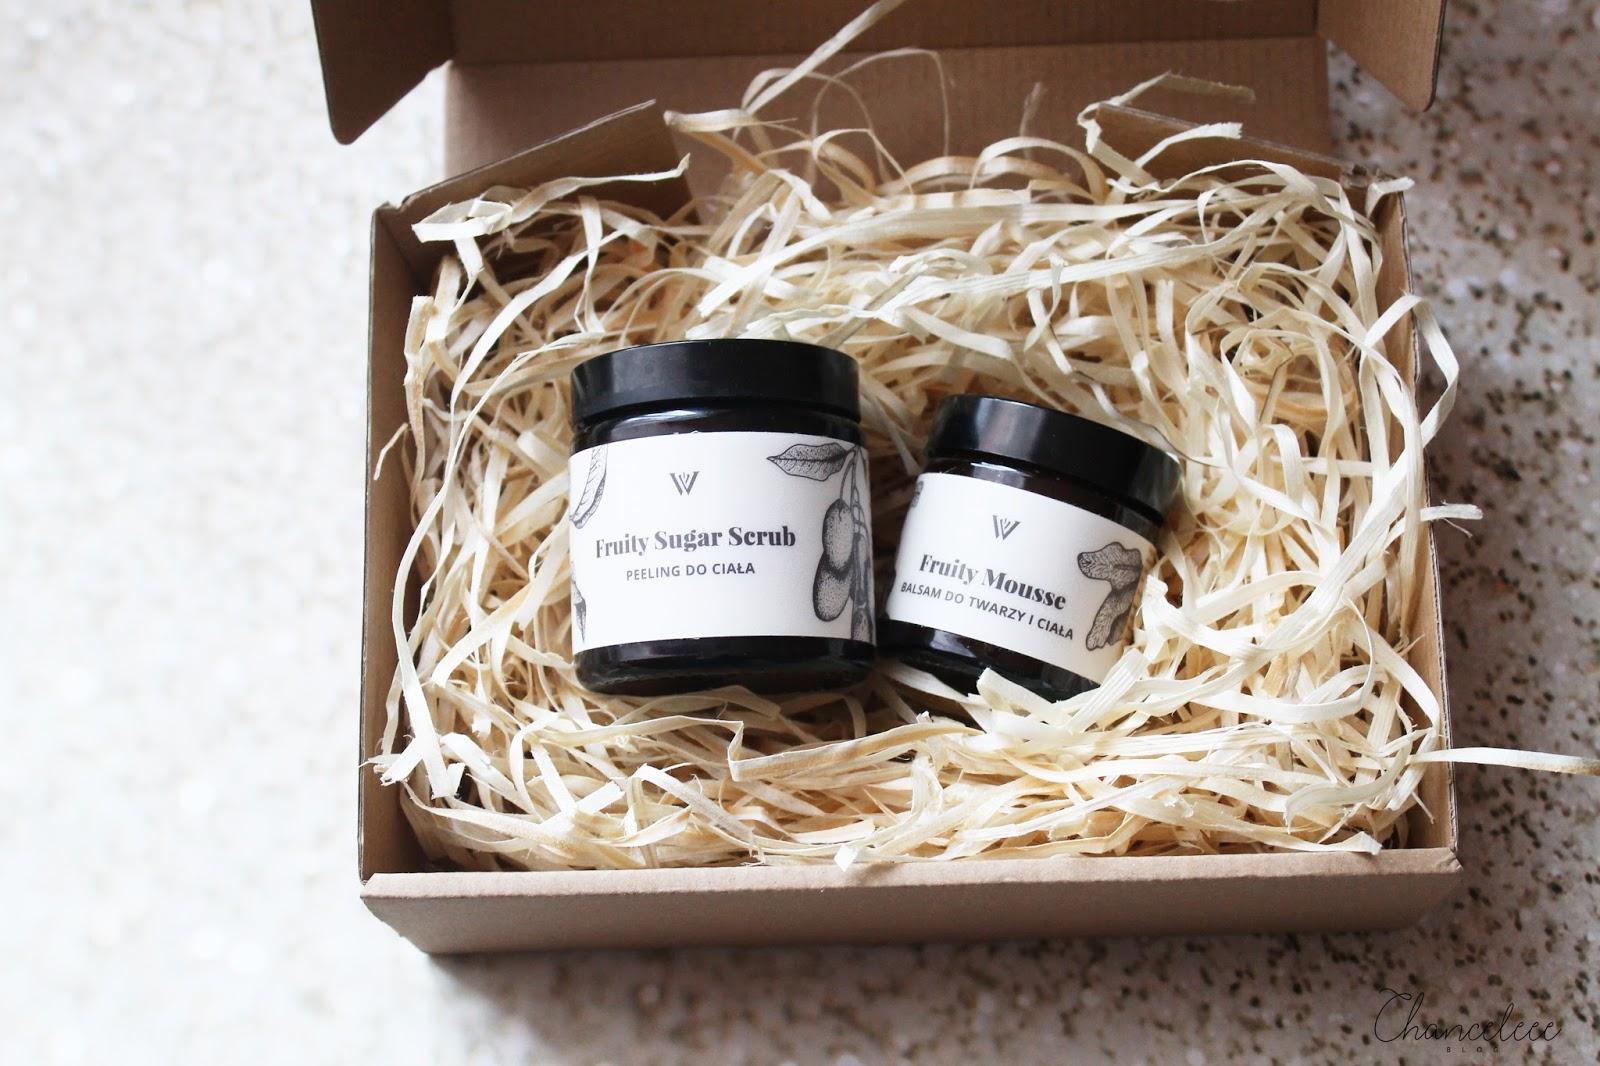 Willow organics recenzja